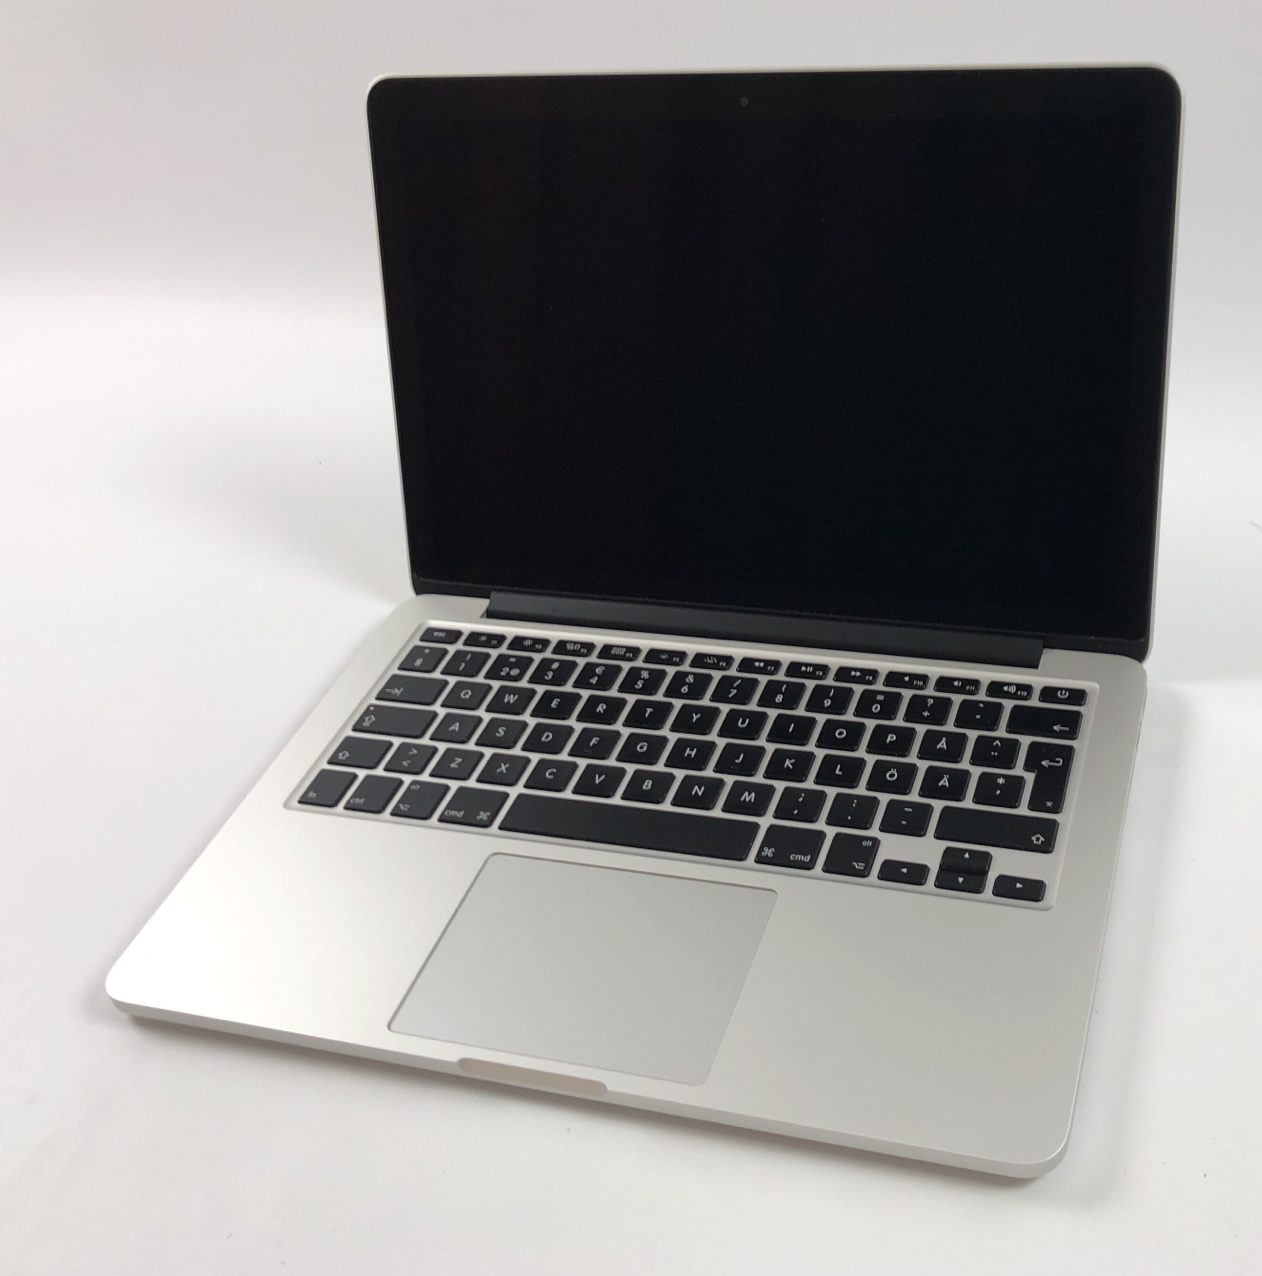 "MacBook Pro Retina 13"" Mid 2014 (Intel Core i5 2.6 GHz 8 GB RAM 128 GB SSD), Intel Core i5 2.6 GHz, 8 GB RAM, 128 GB SSD, Kuva 1"